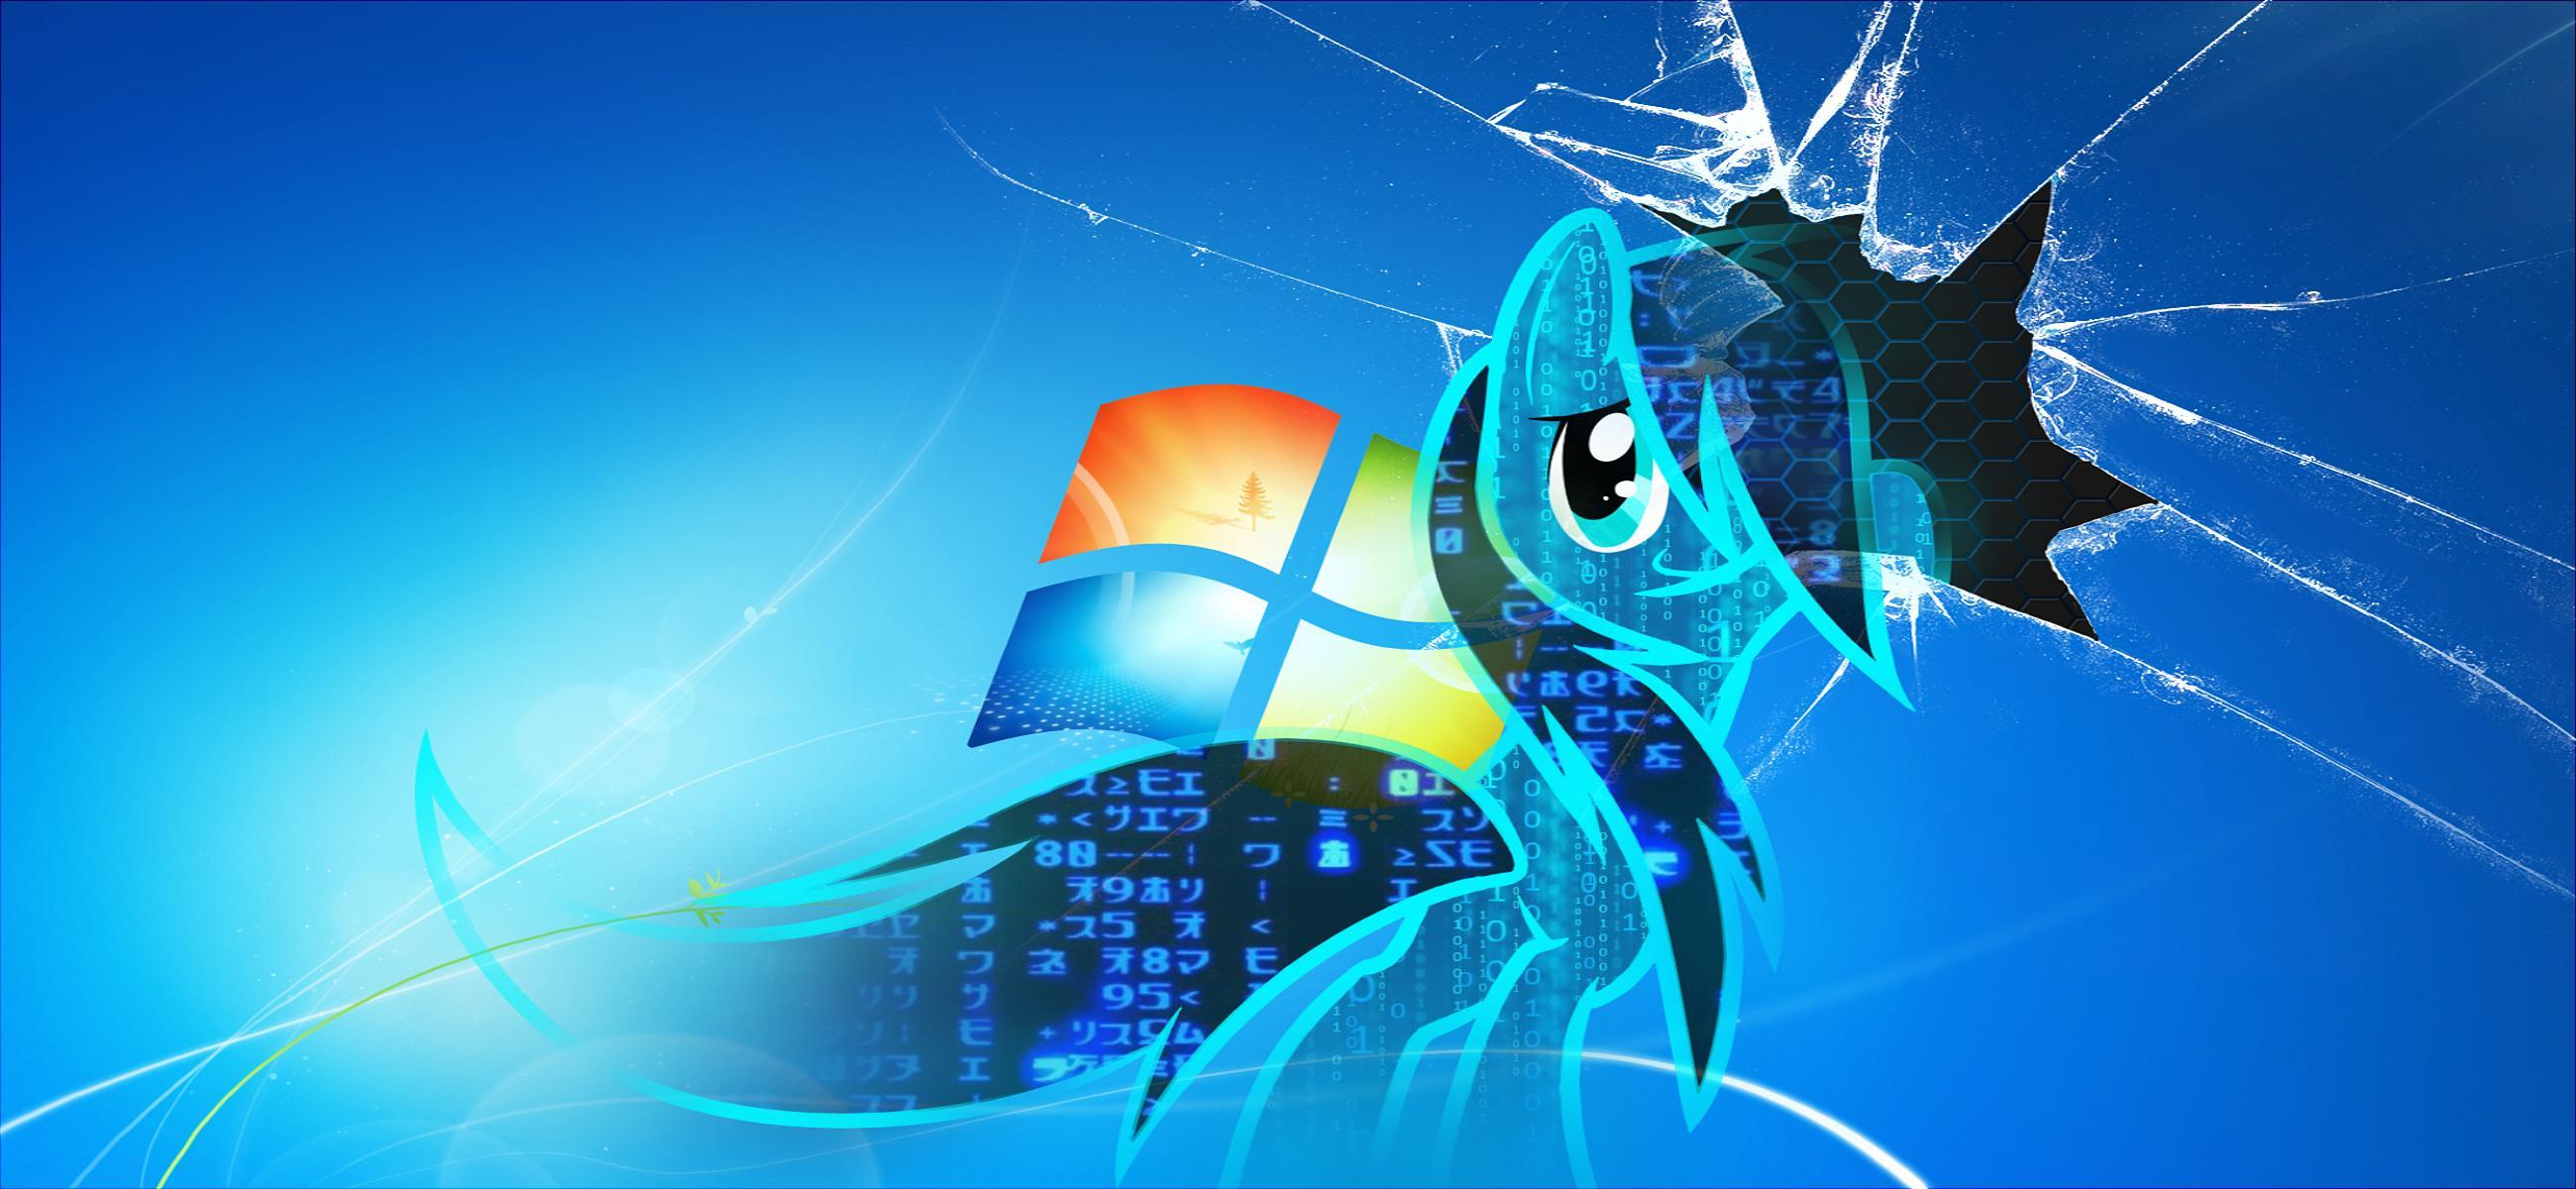 Broken Windows 7 Wallpaper